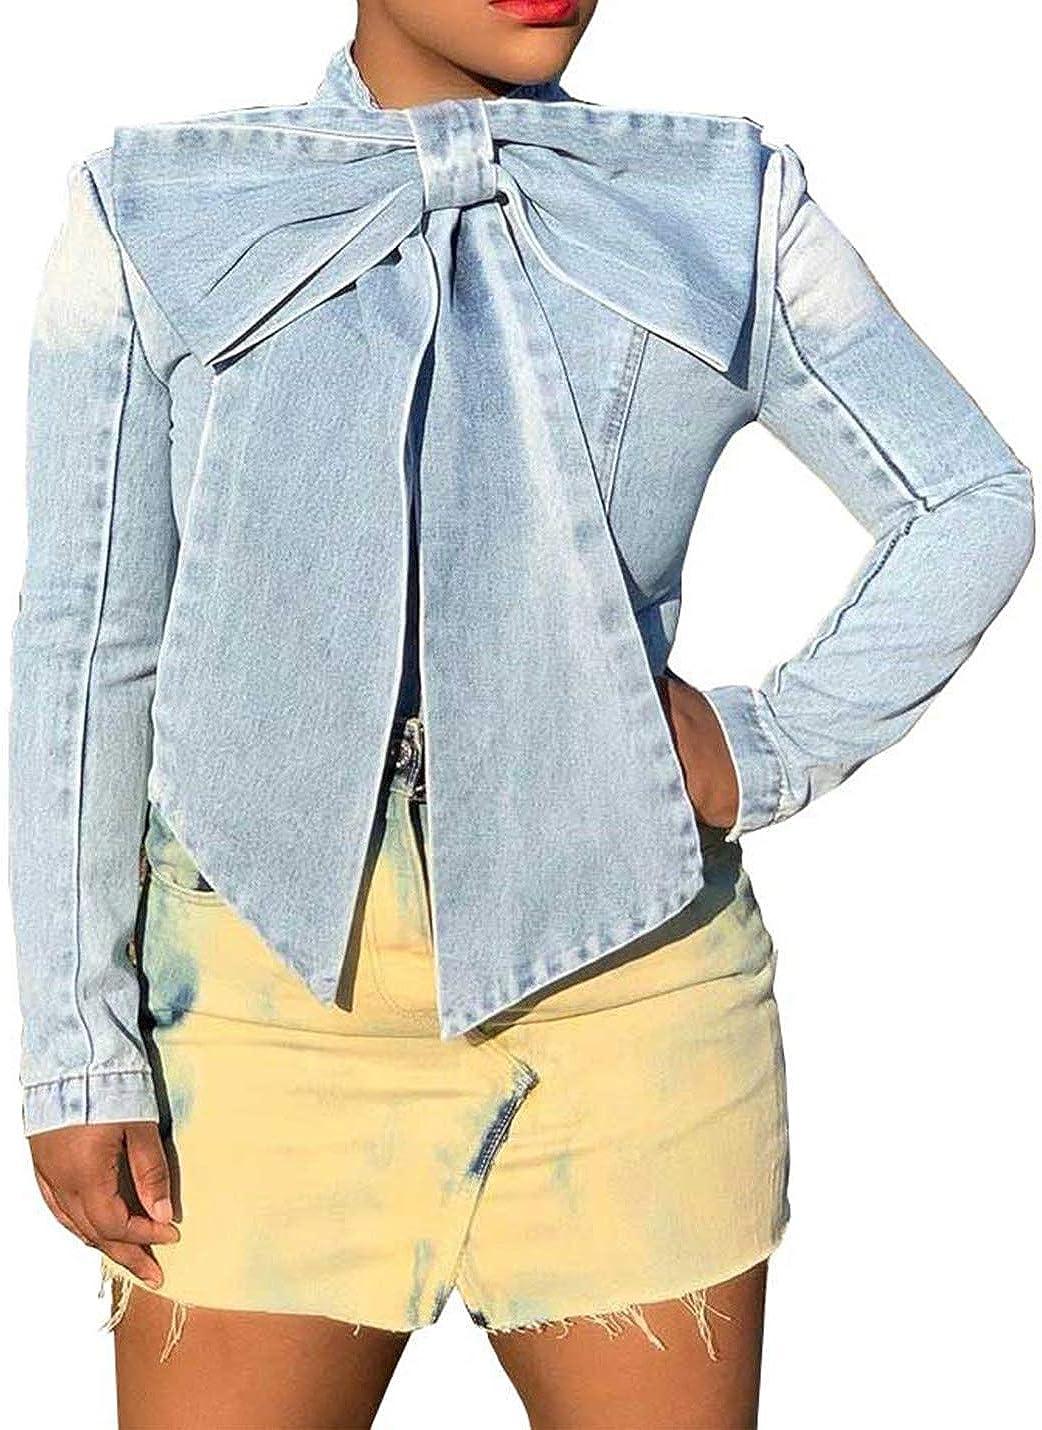 Yimoon Women's Casual Cropped Button Down Bowknot Denim Trucker Jacket Outerwear